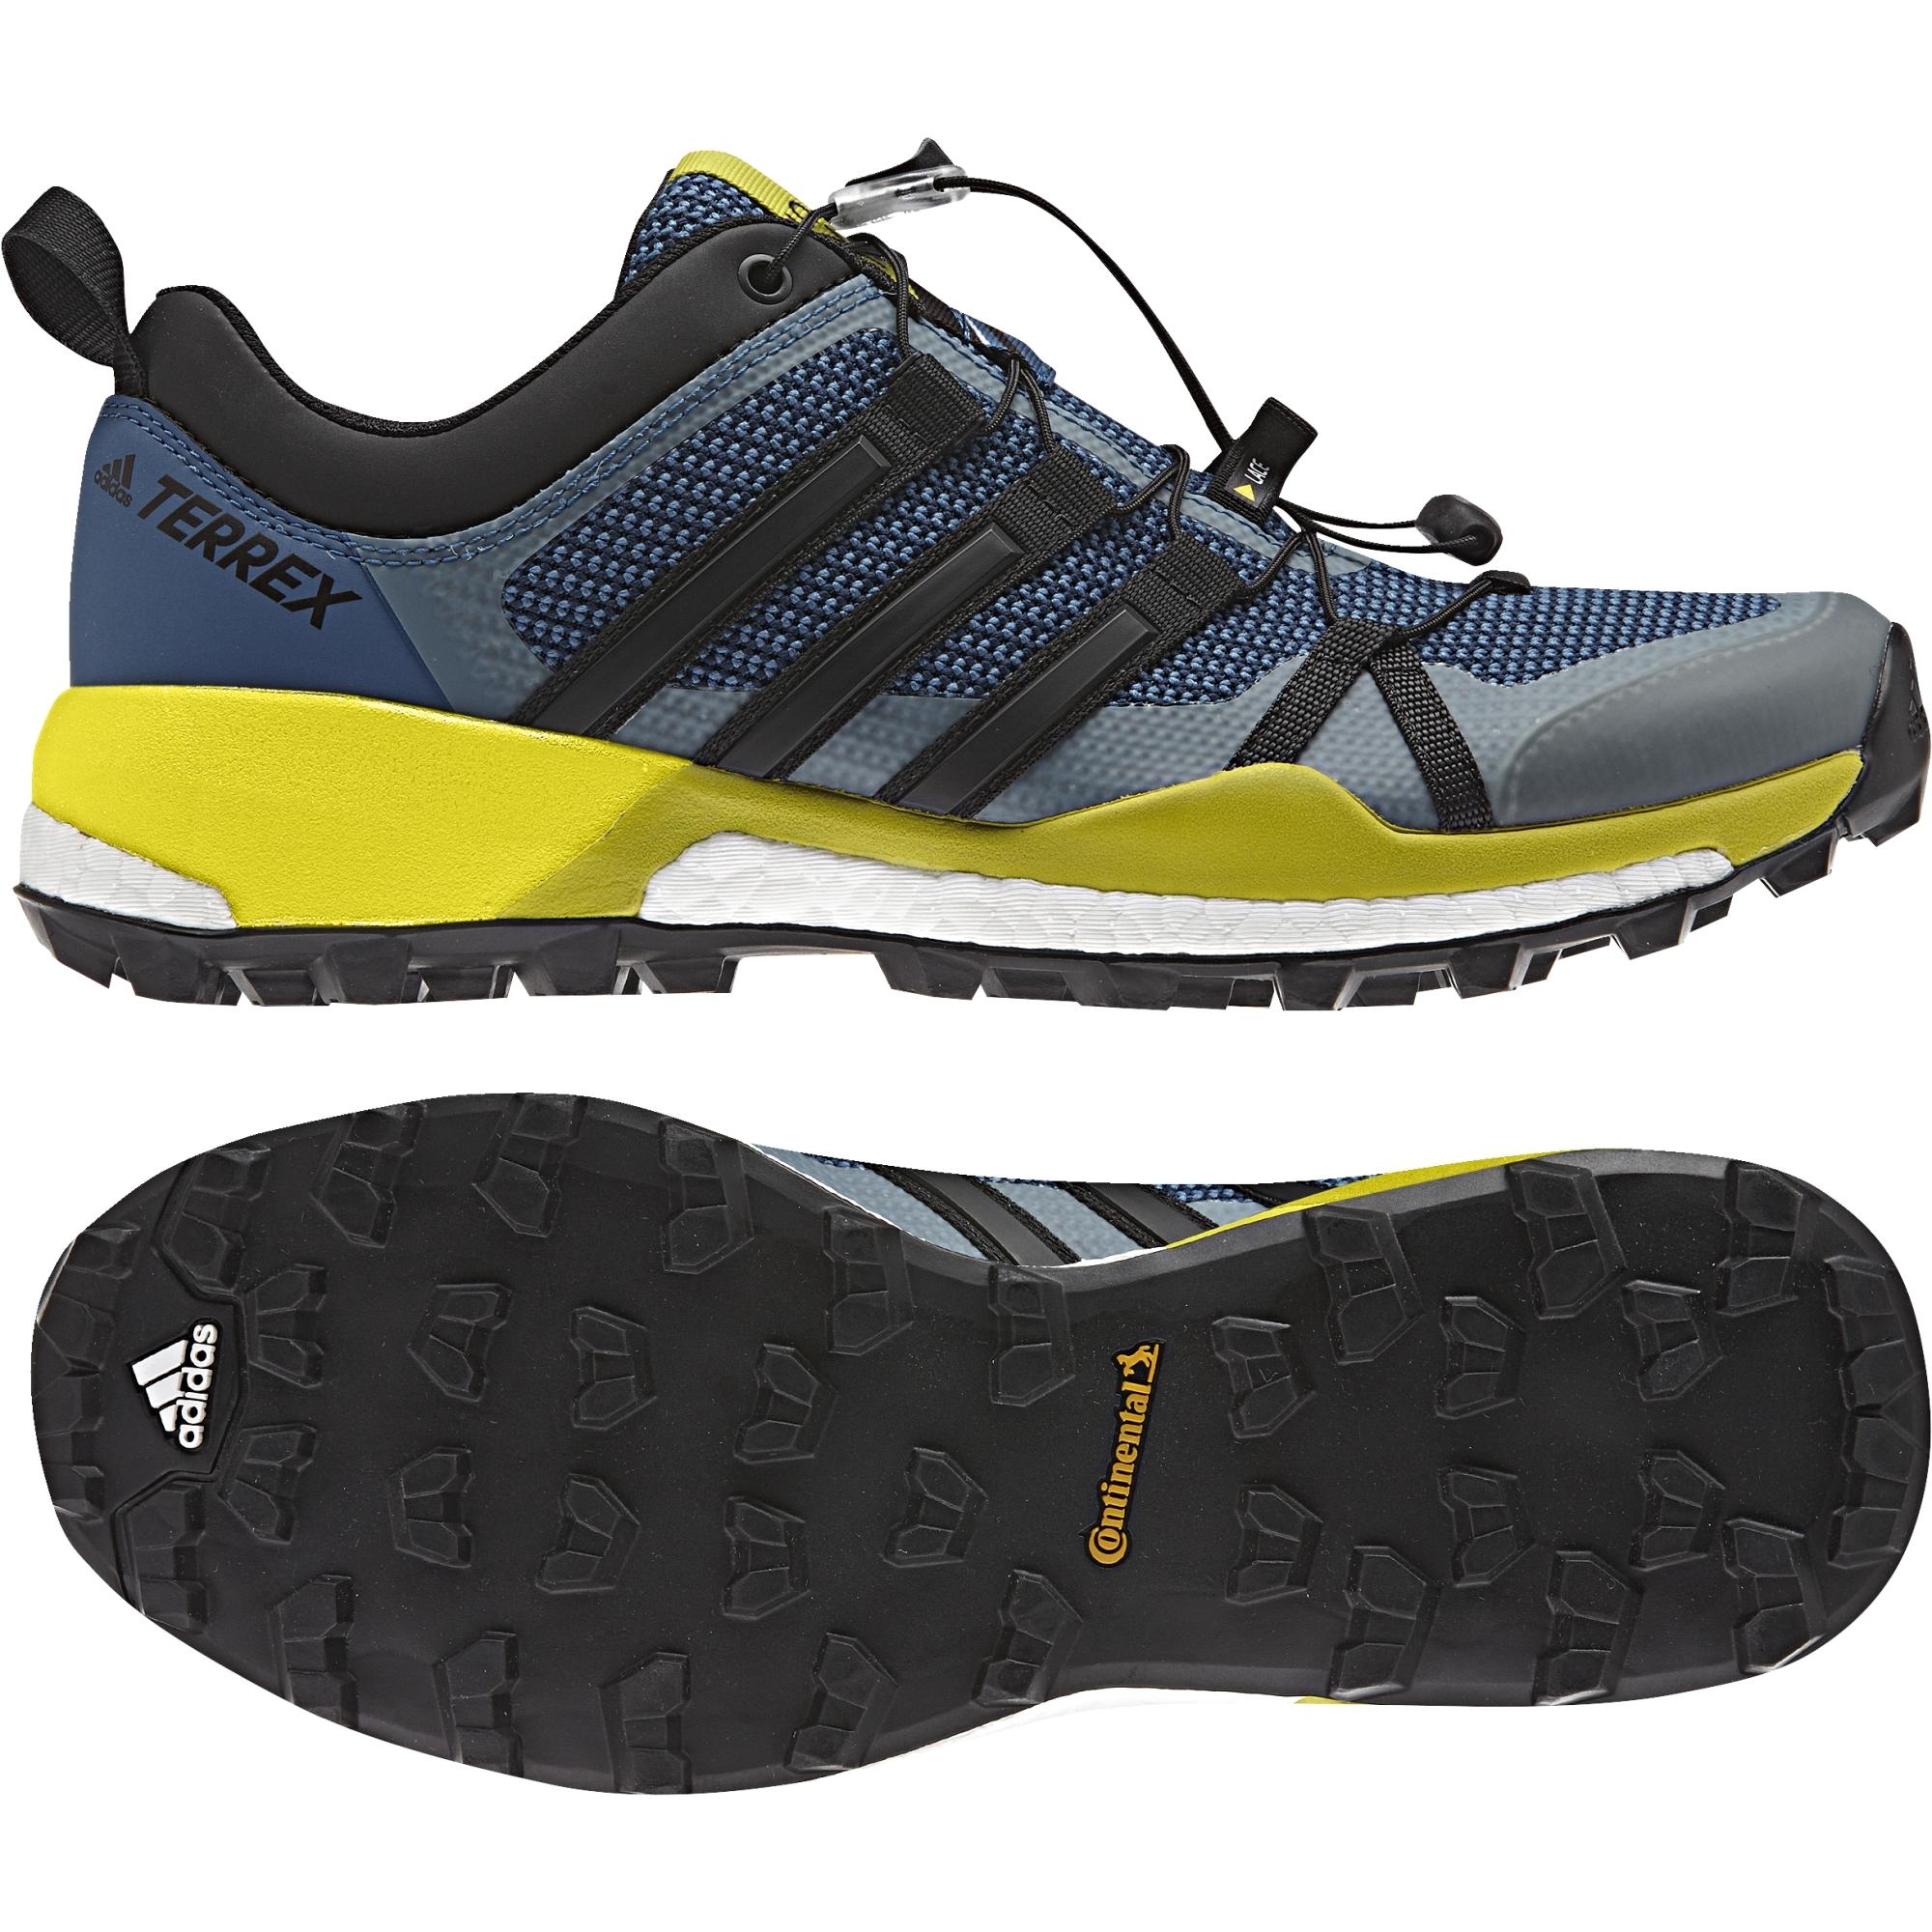 adidas terrex skychaser herren trailrunning schuhe herren running laufschuhe trail laufschuhe. Black Bedroom Furniture Sets. Home Design Ideas